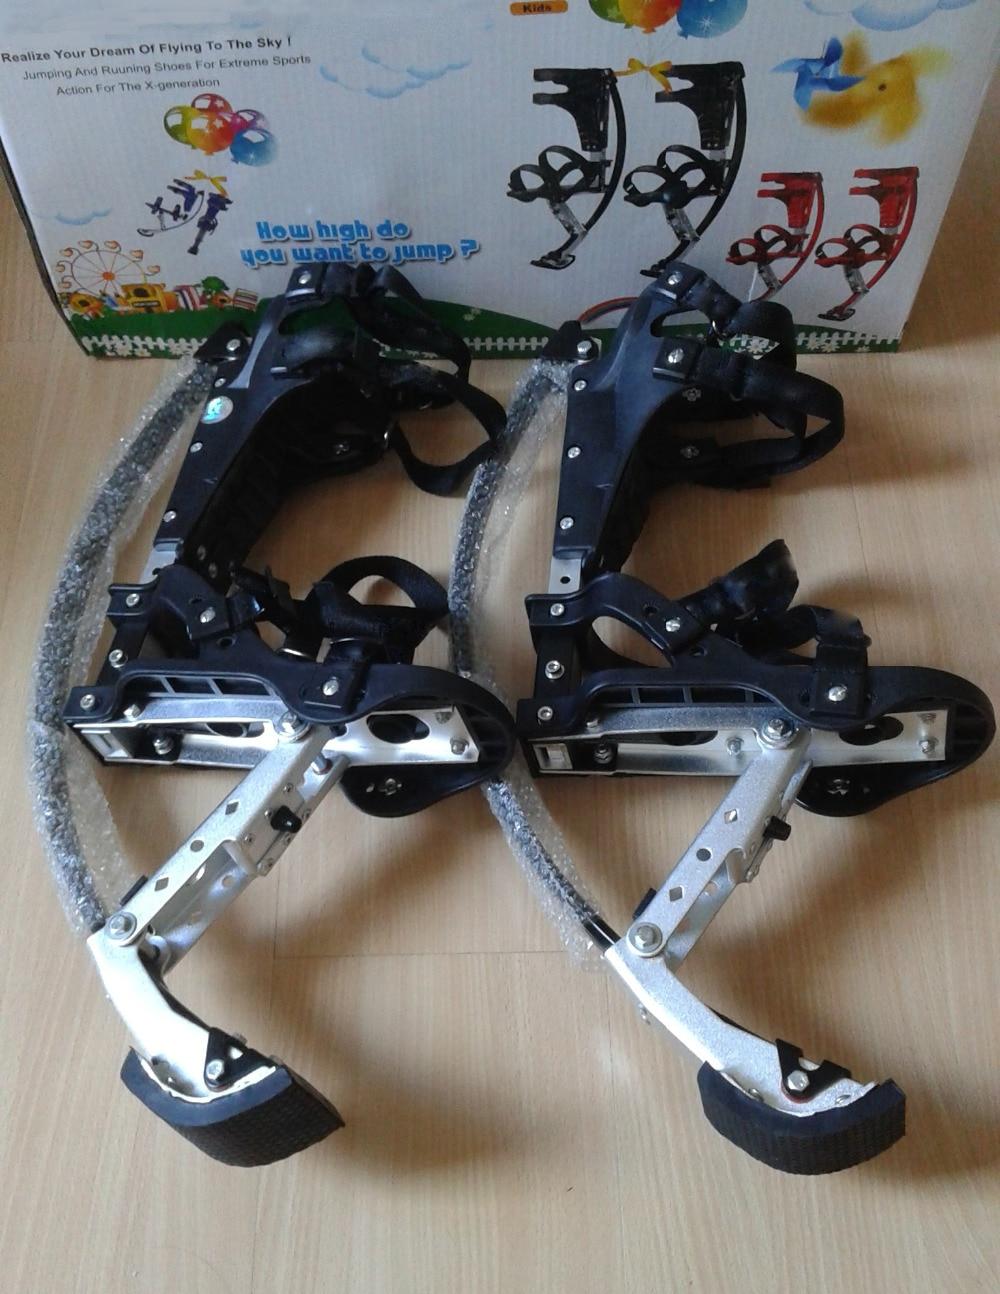 Skyrunner For People Weight 44lbs~88lbs/20kg~40kg Black Jumping Stilts/skyrunner/Jump Shoes/Flying Shoes